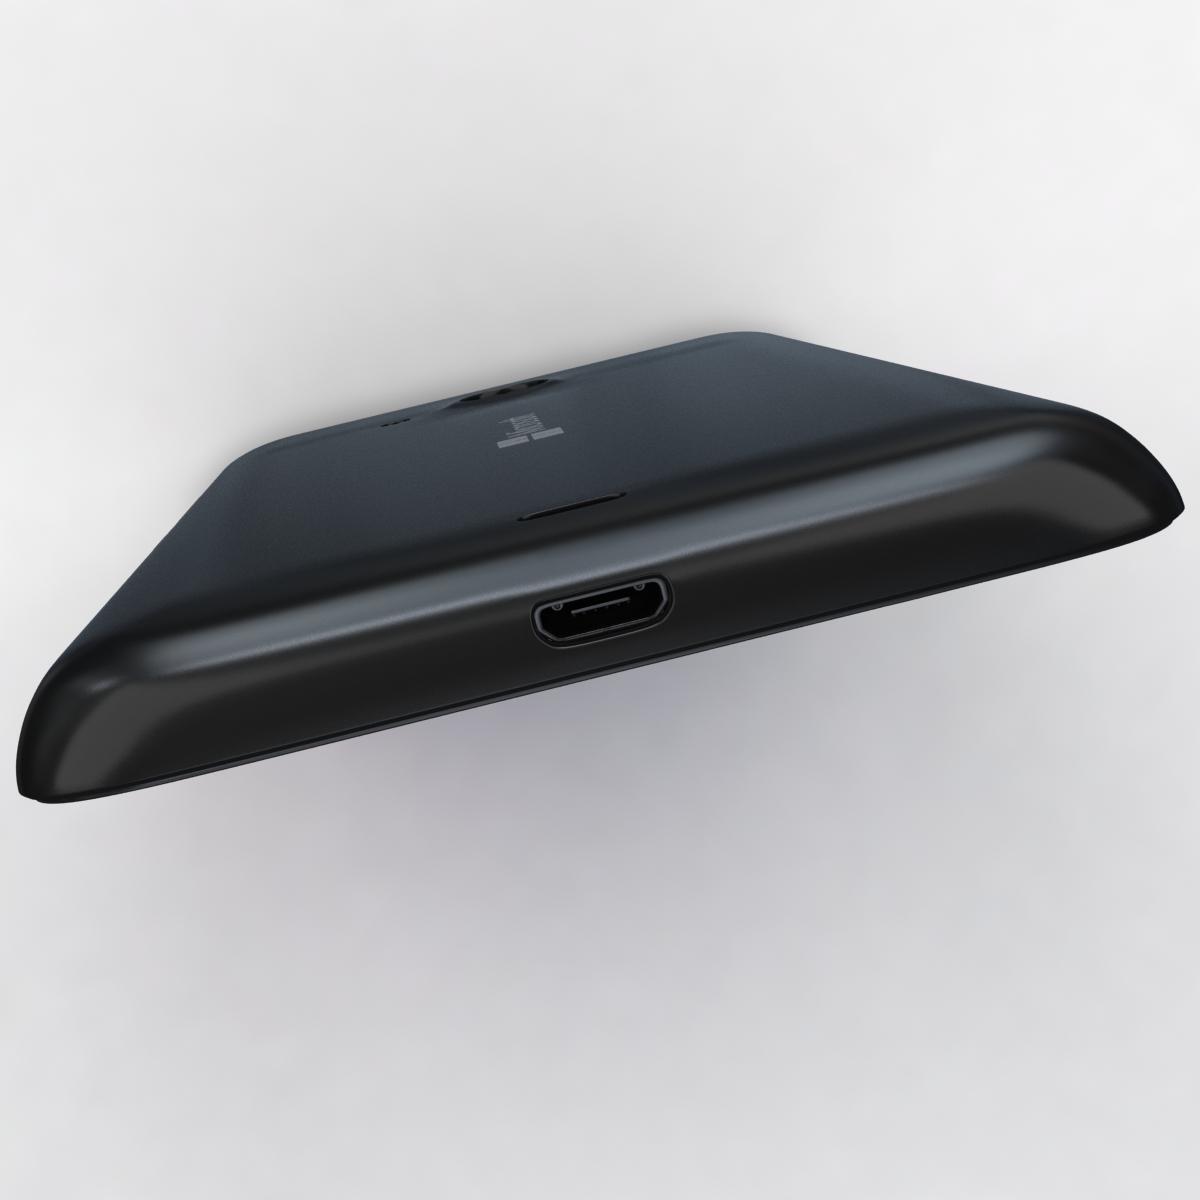 microsoft lumia 535 and dual sim black 3d model 3ds max fbx c4d obj 204364